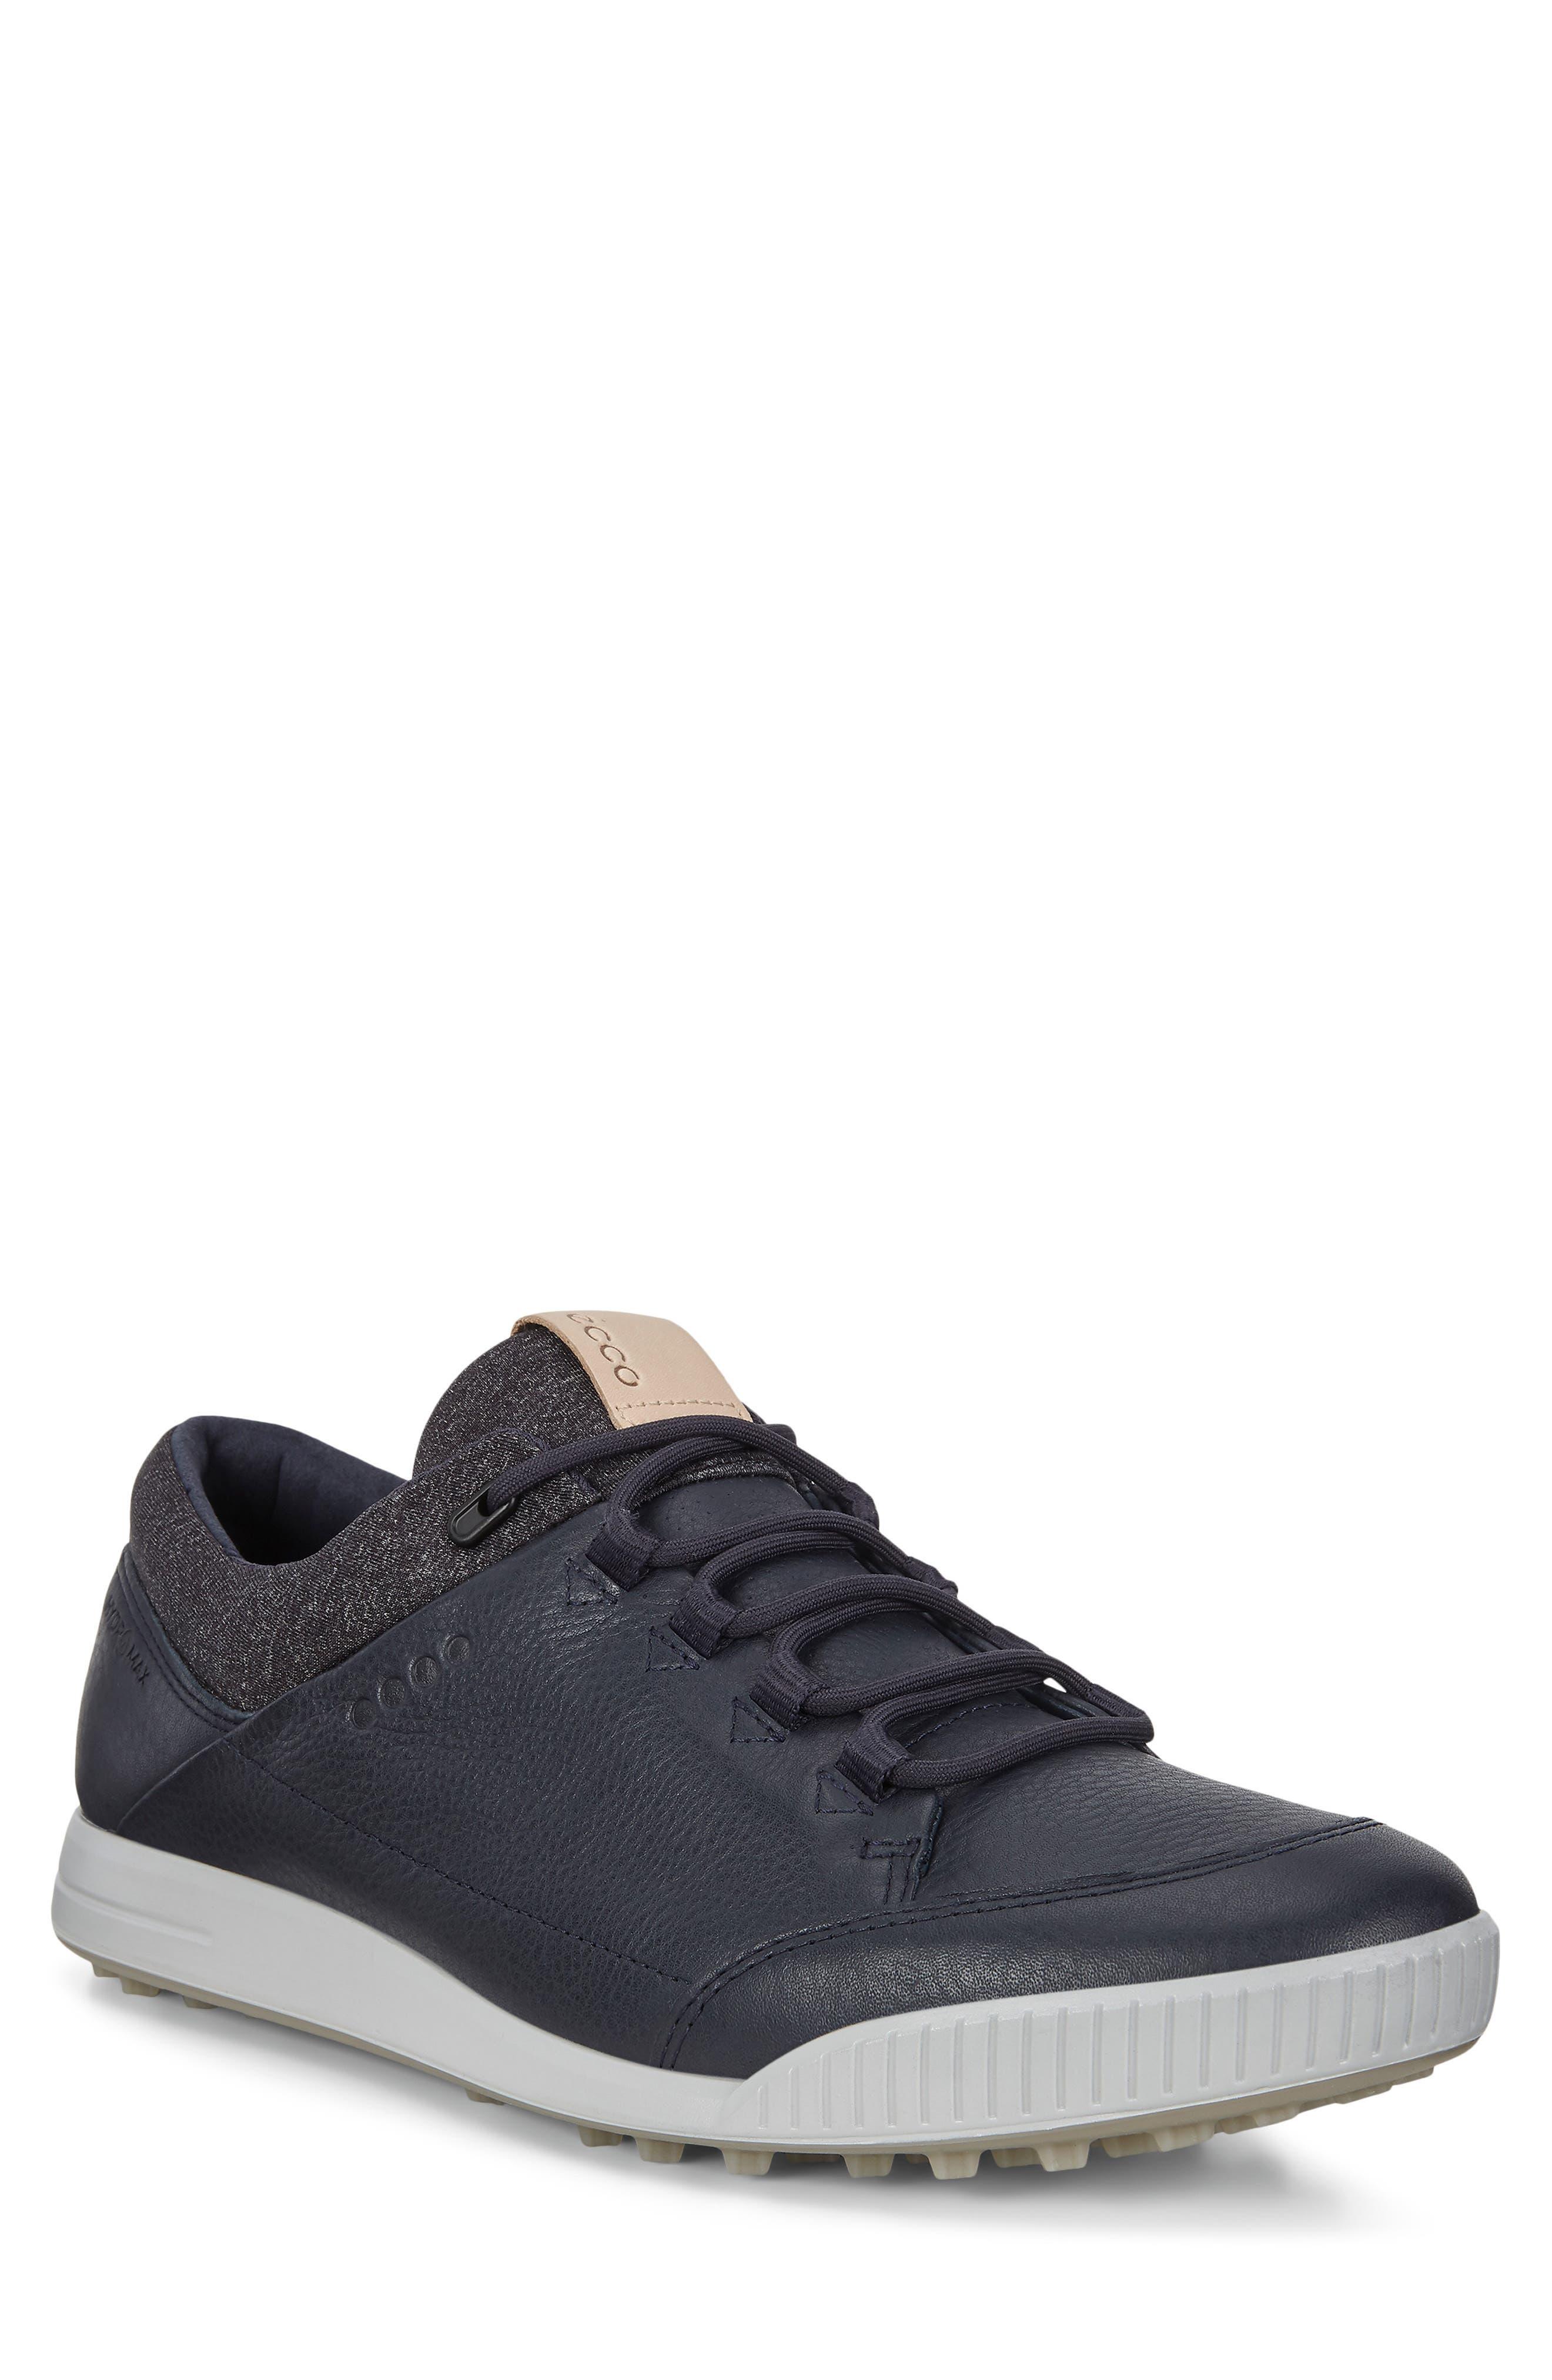 Men's Ecco Street Retro Golf Sneaker